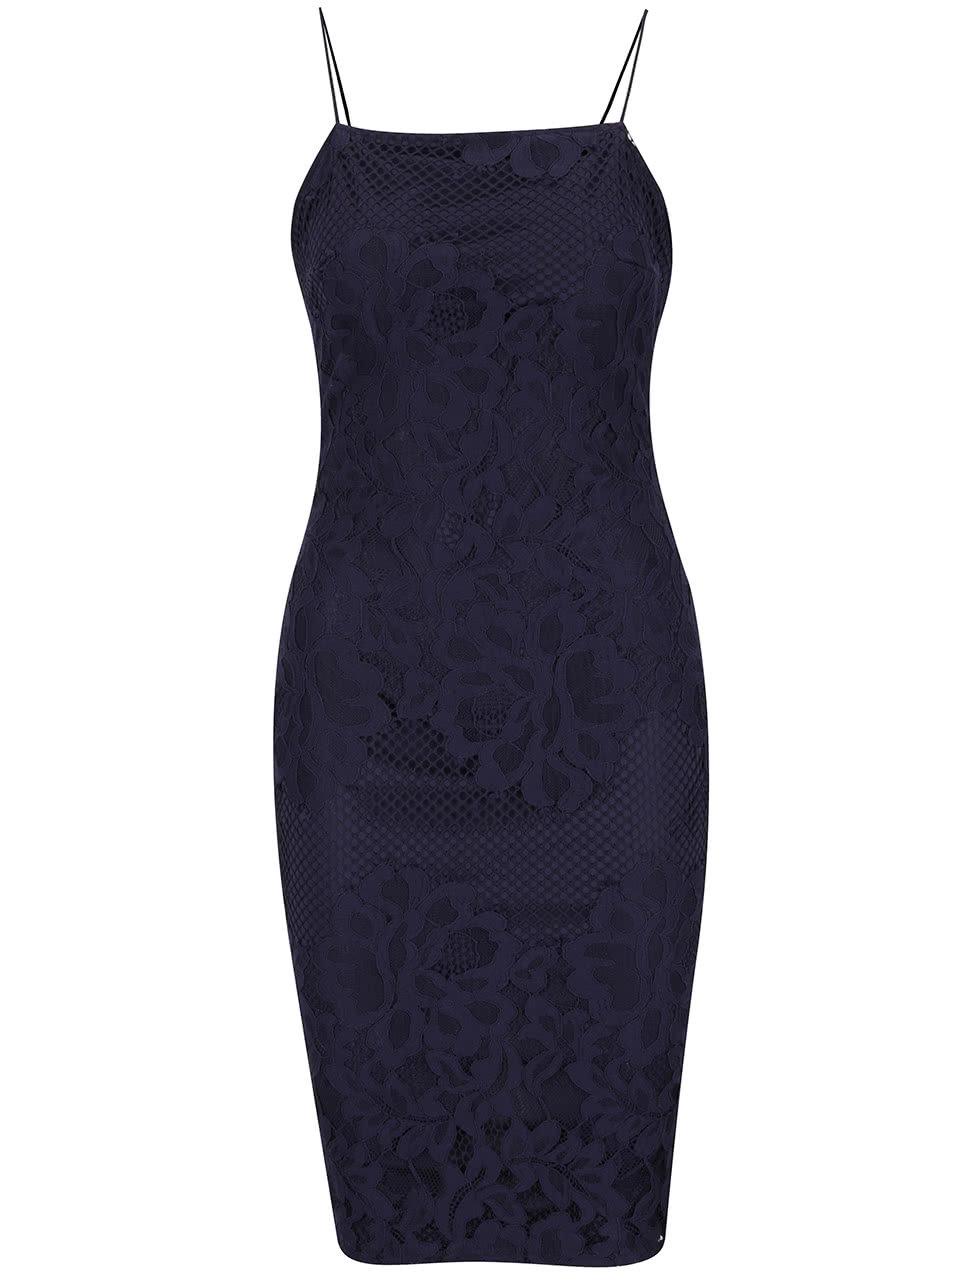 5f9b37dd67f6 Tmavomodré šaty s tenkými ramienkami AX Paris ...